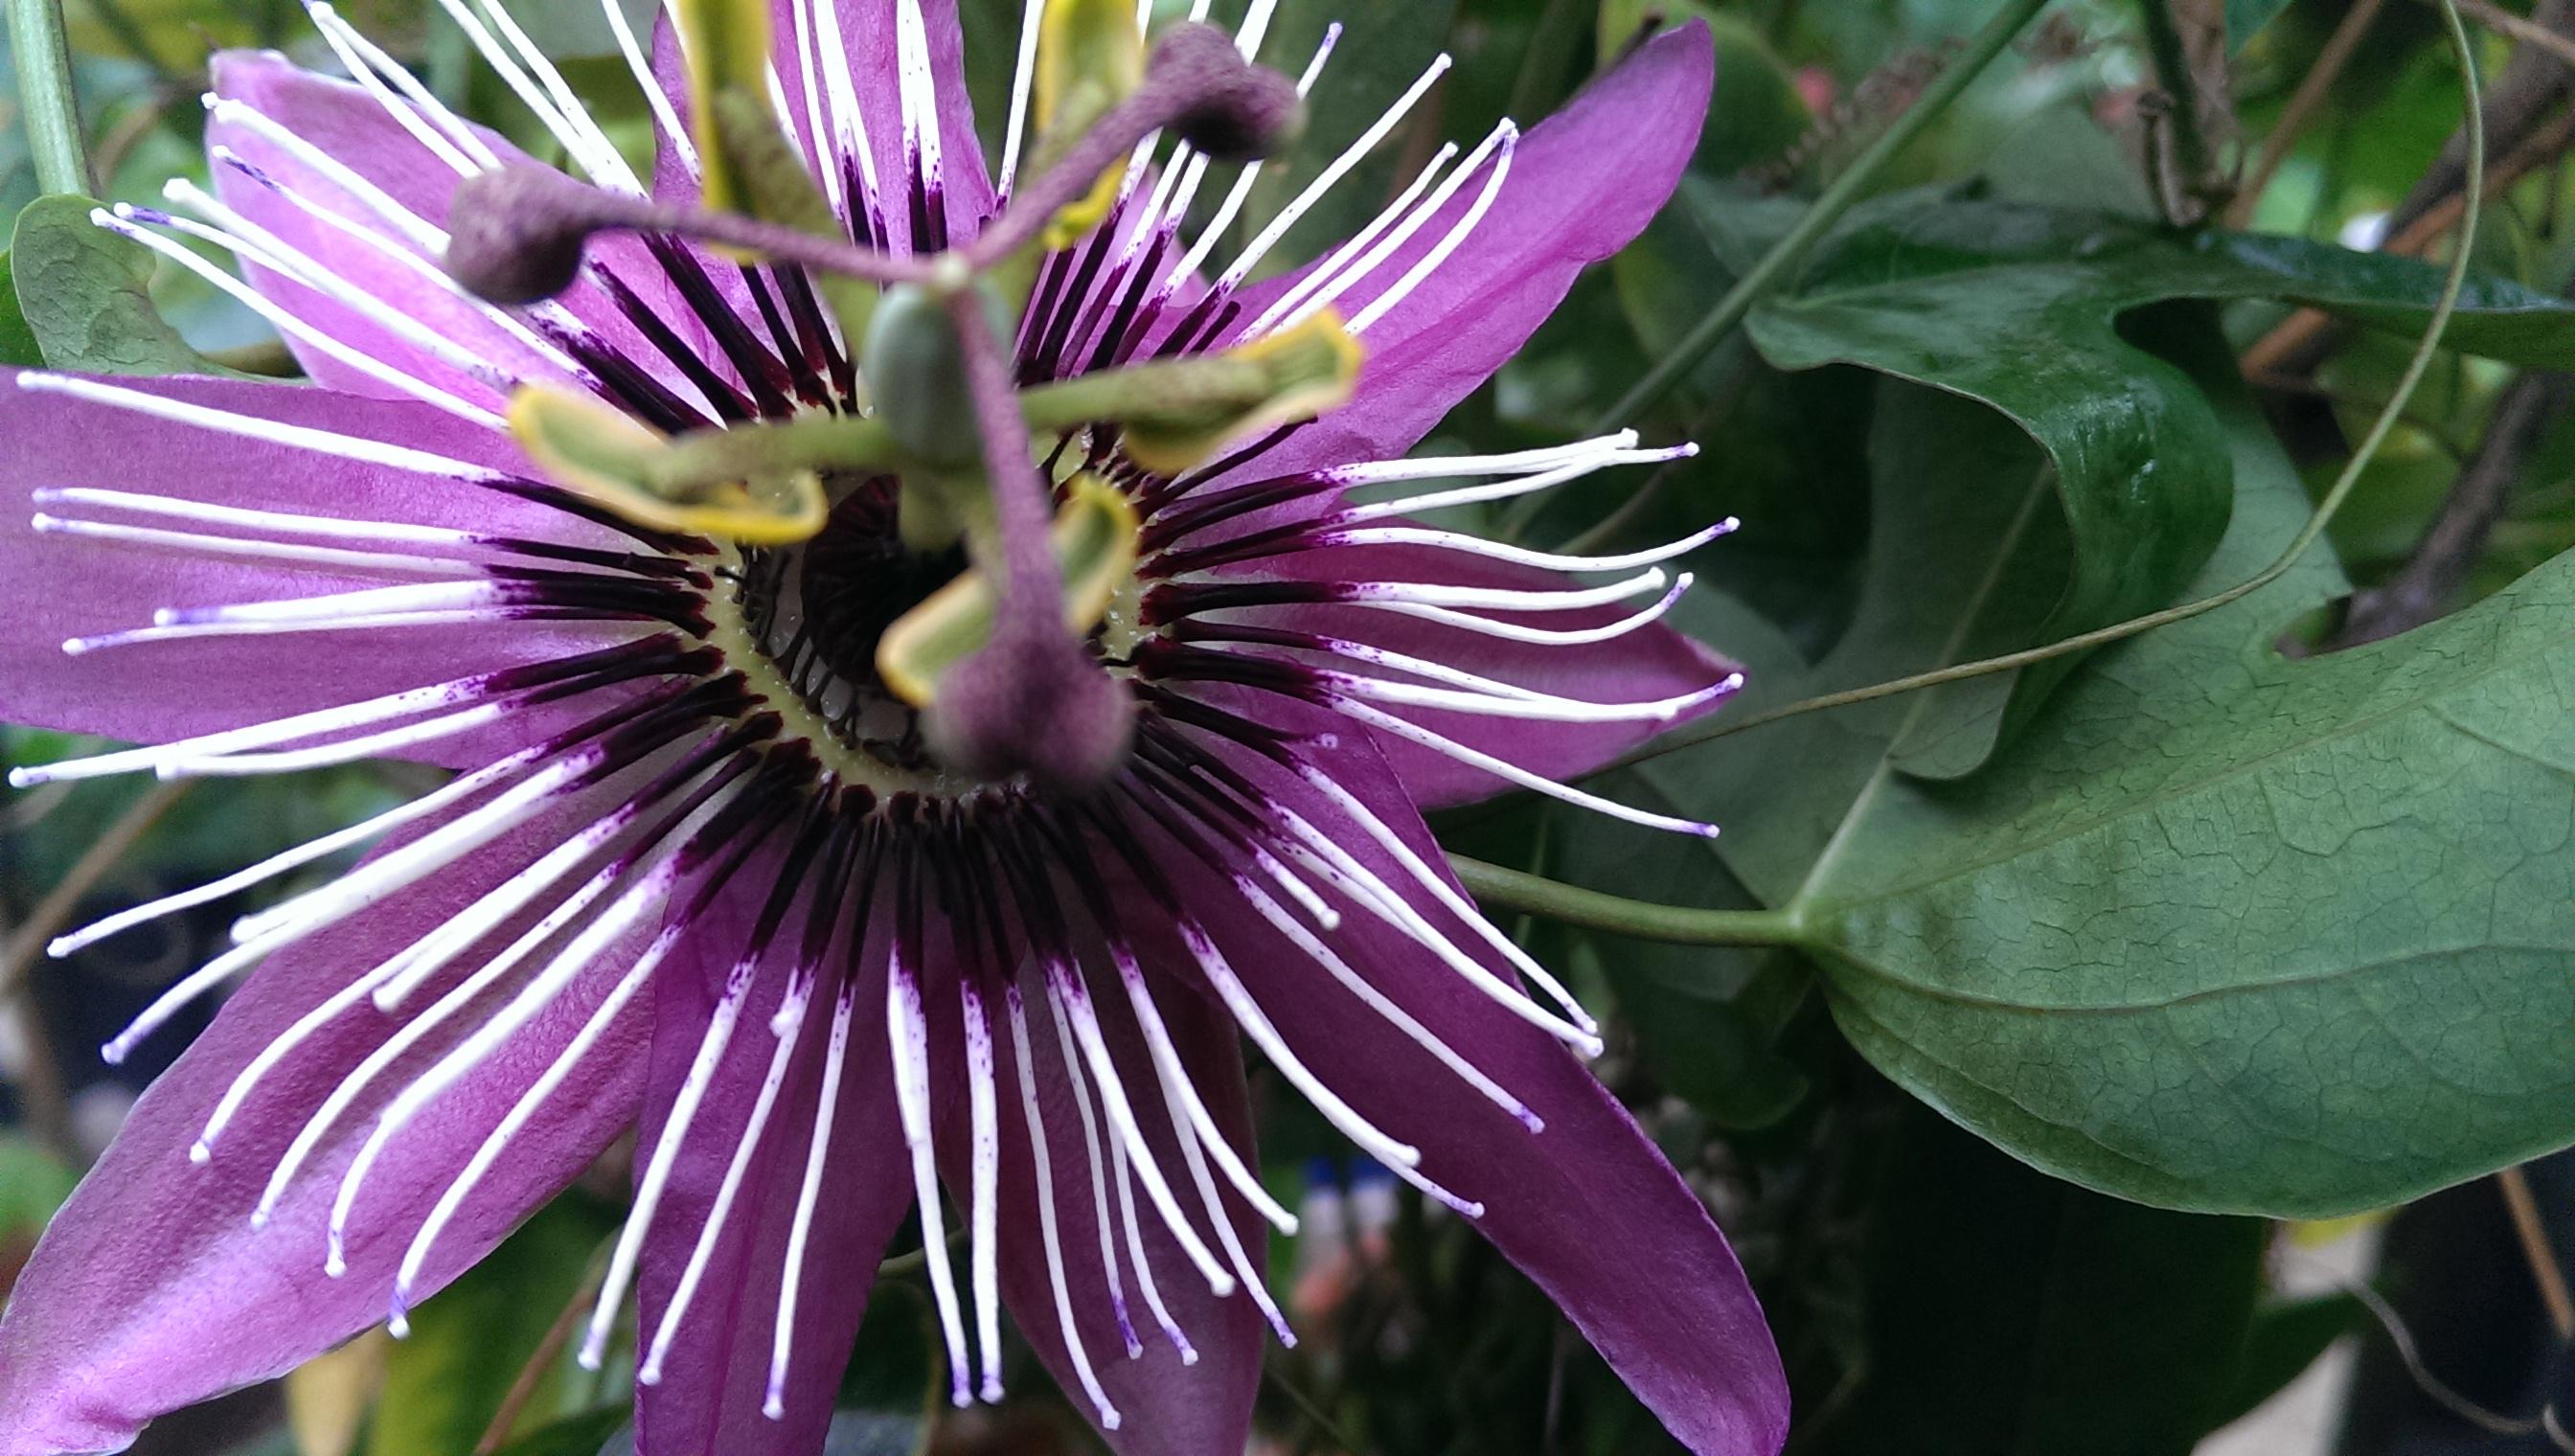 Passiflora caerulea, Passionsblume